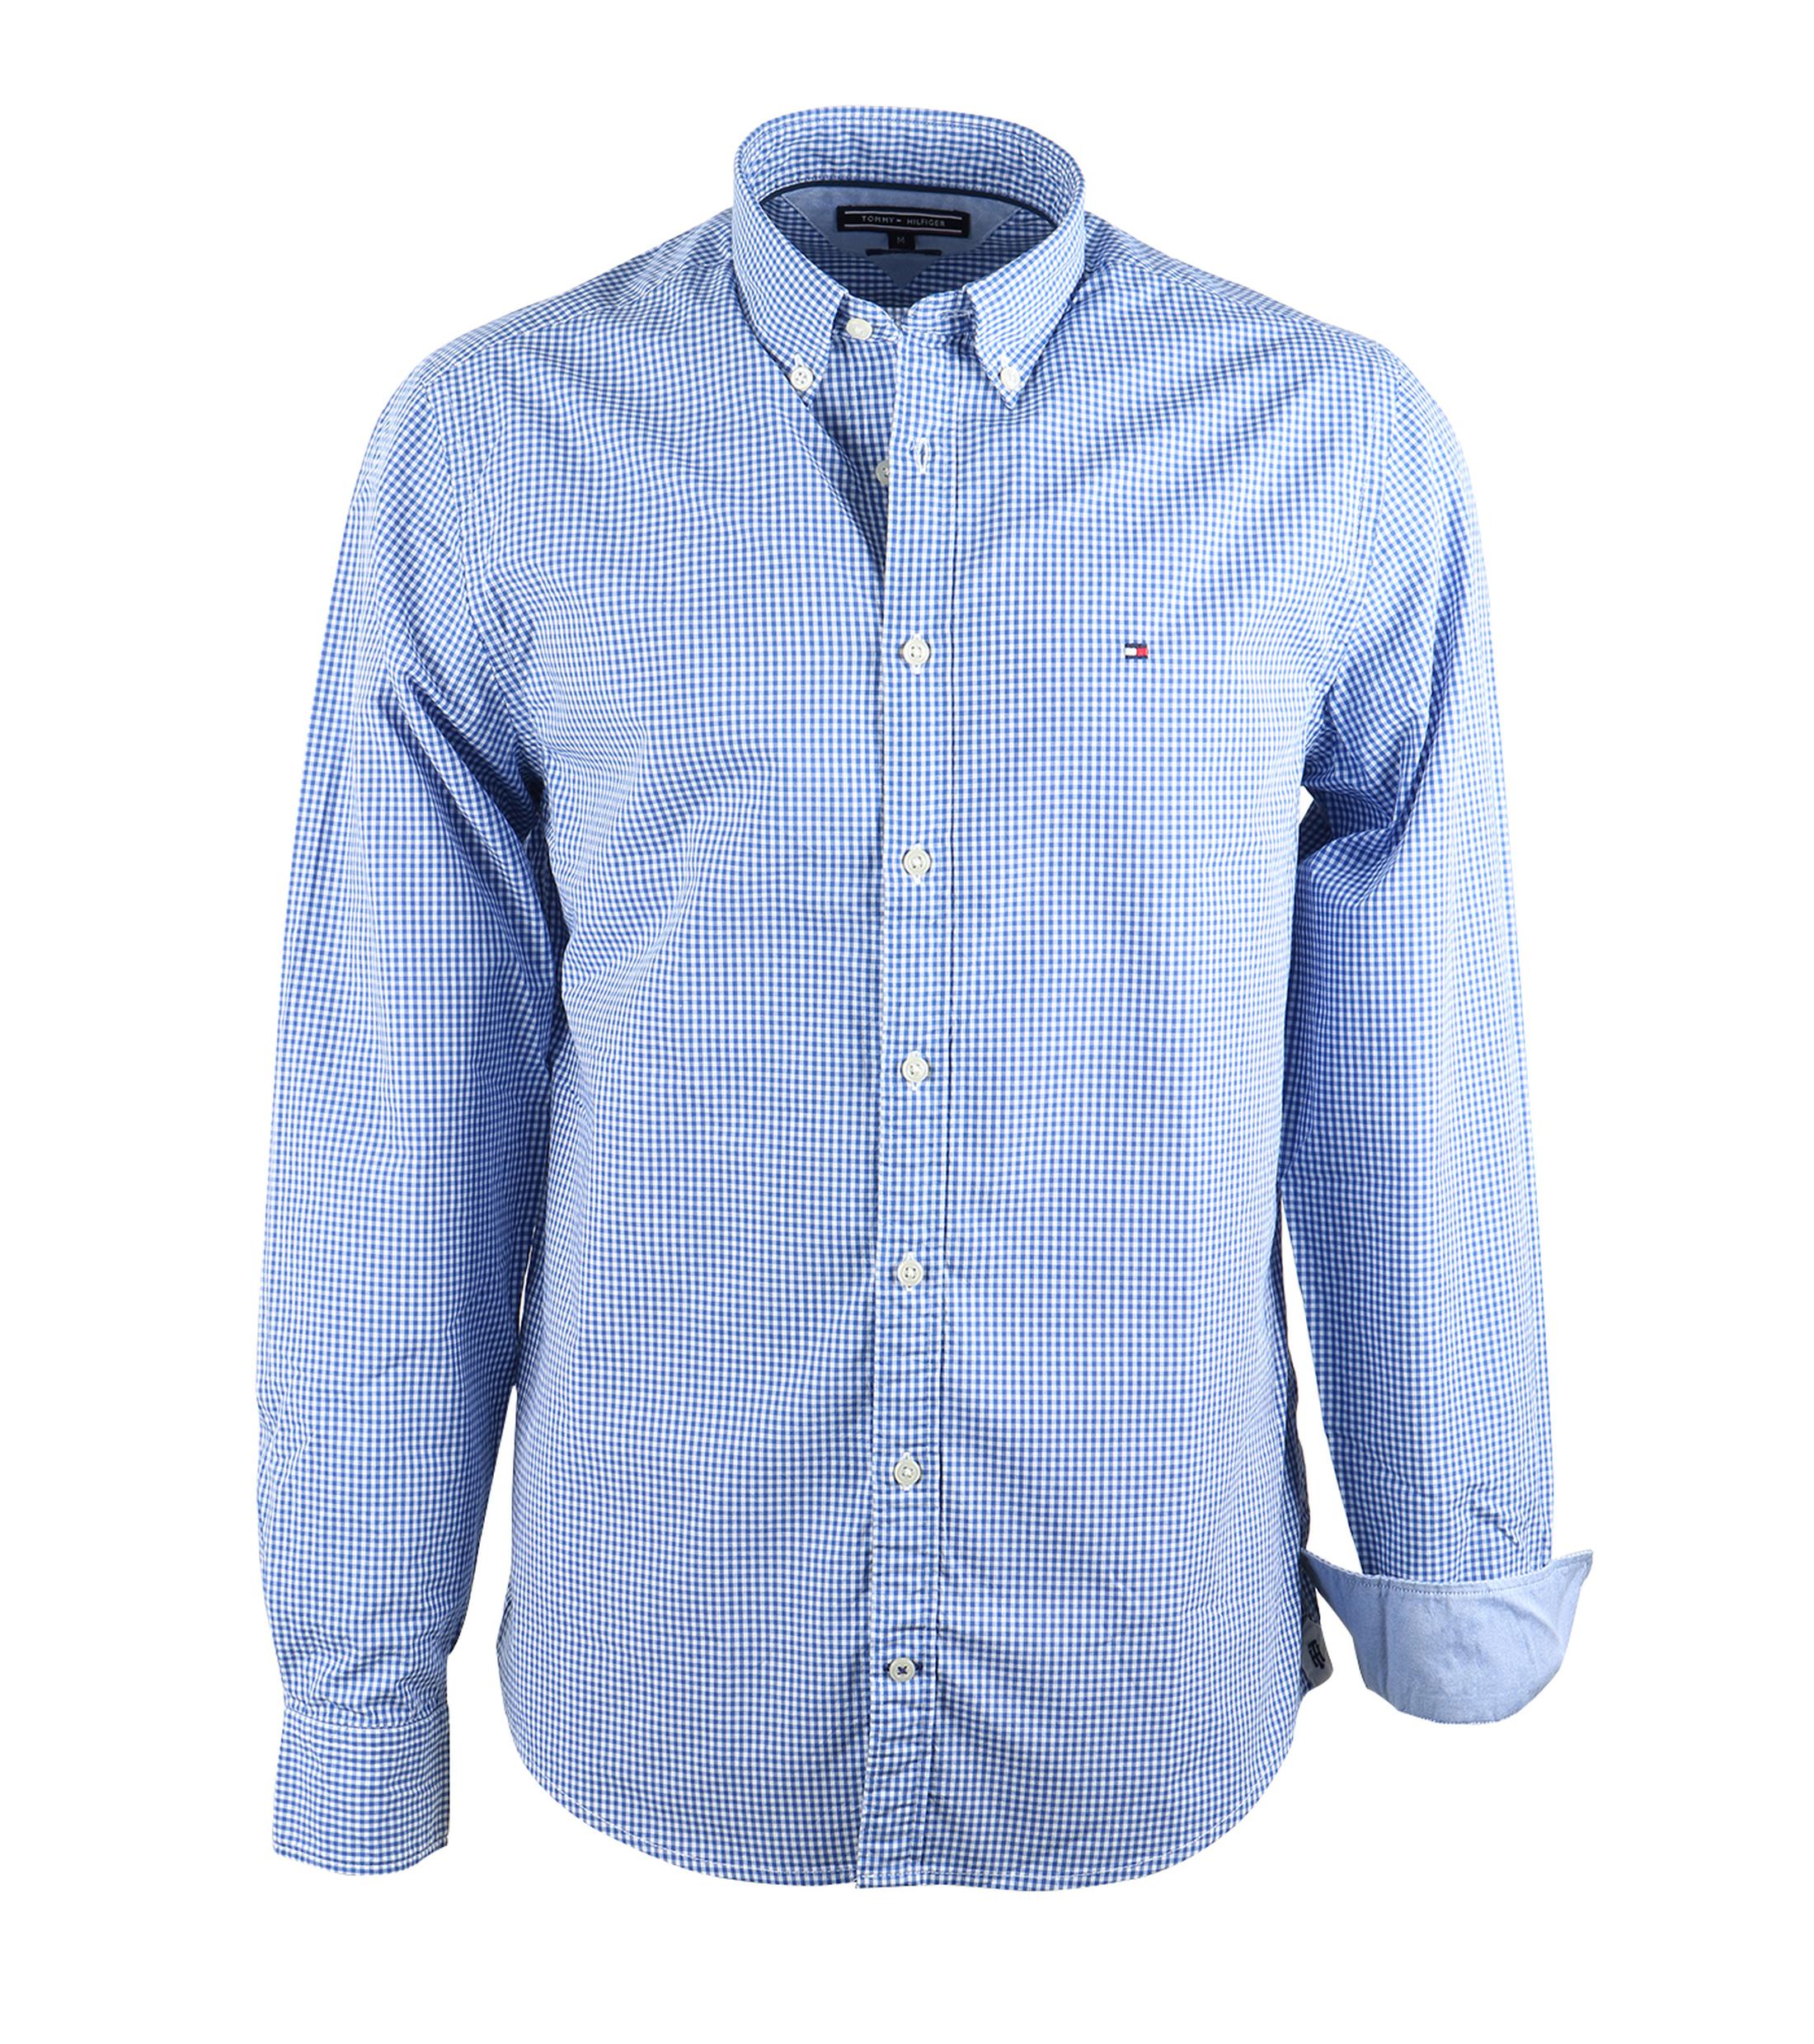 Tommy Hilfiger Shirt Blue Check Order Online Suitable